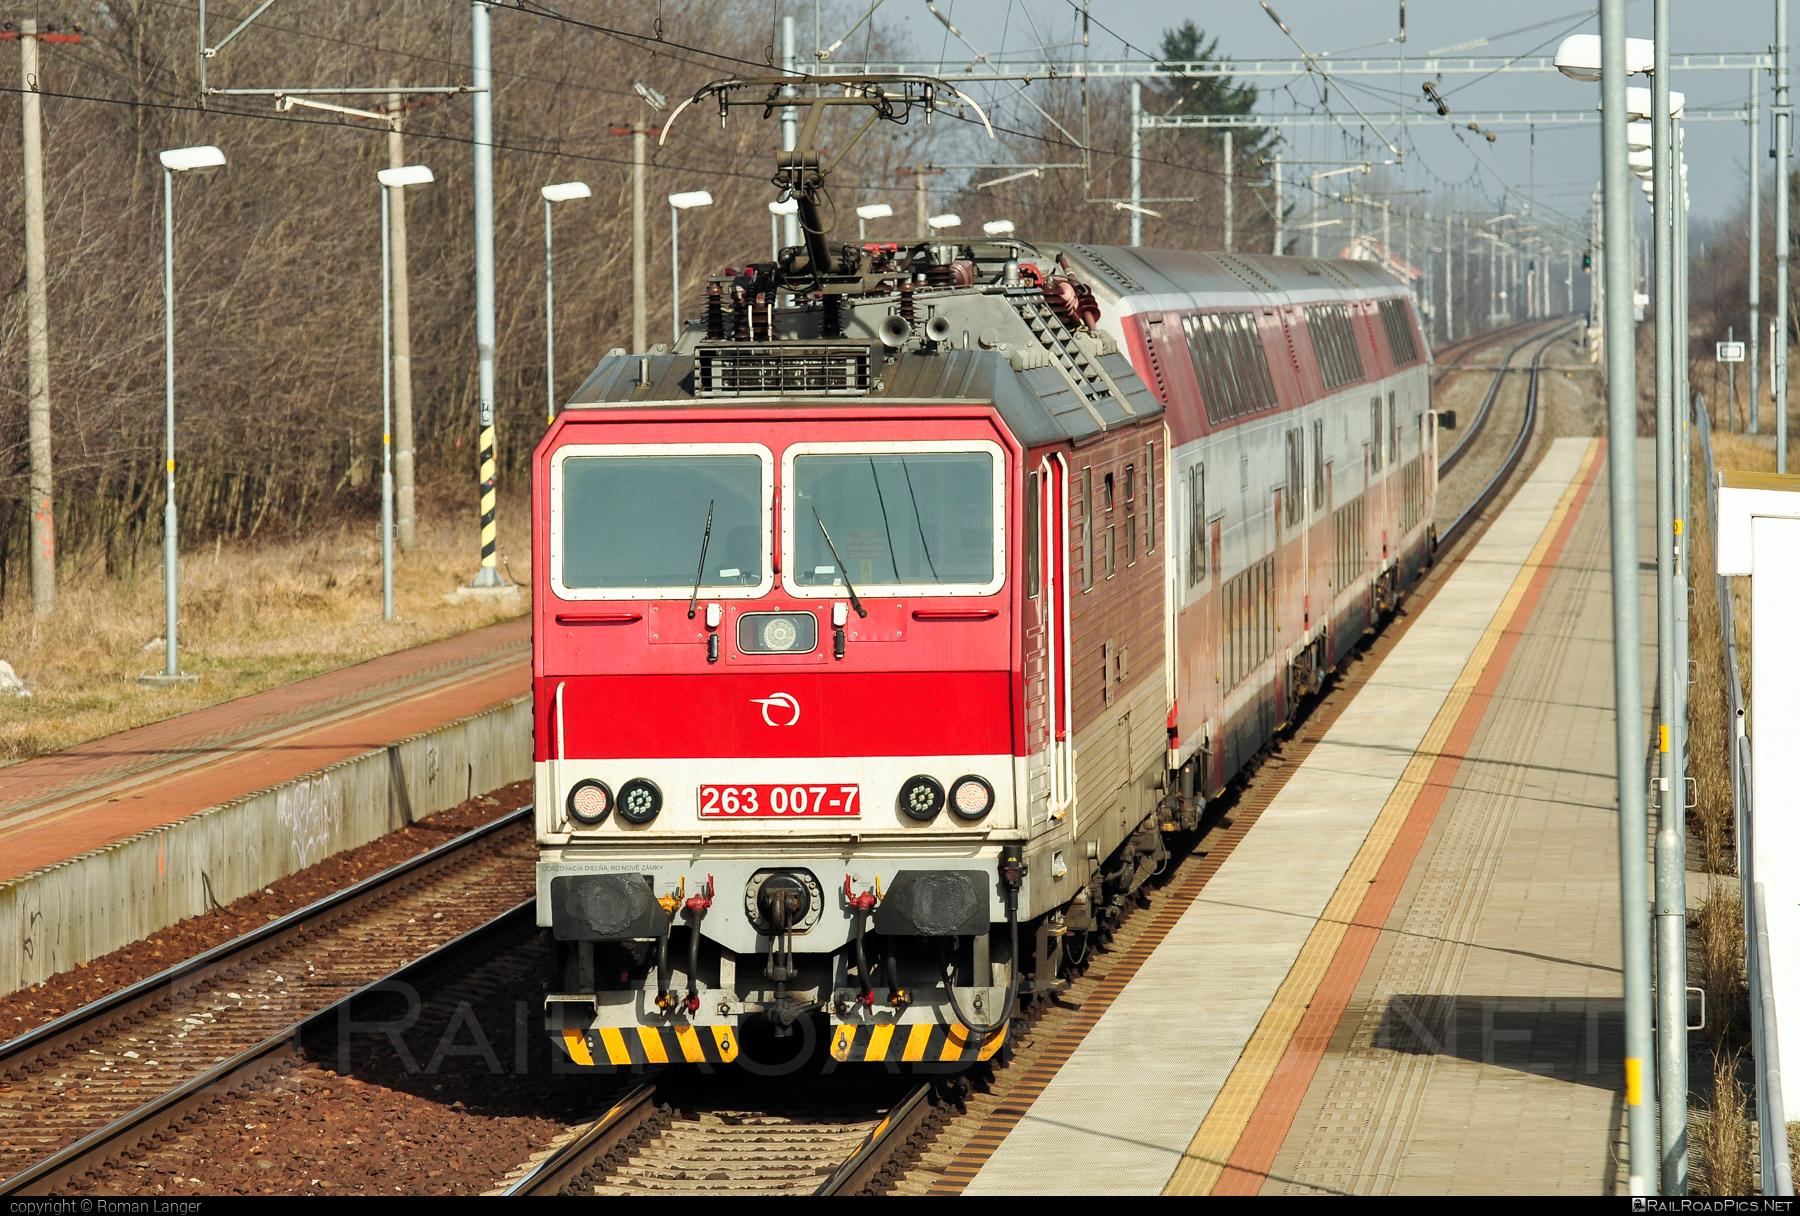 Škoda 70E - 263 007-7 operated by Železničná Spoločnost' Slovensko, a.s. #ZeleznicnaSpolocnostSlovensko #locomotive263 #princezna #skoda #skoda70e #zssk